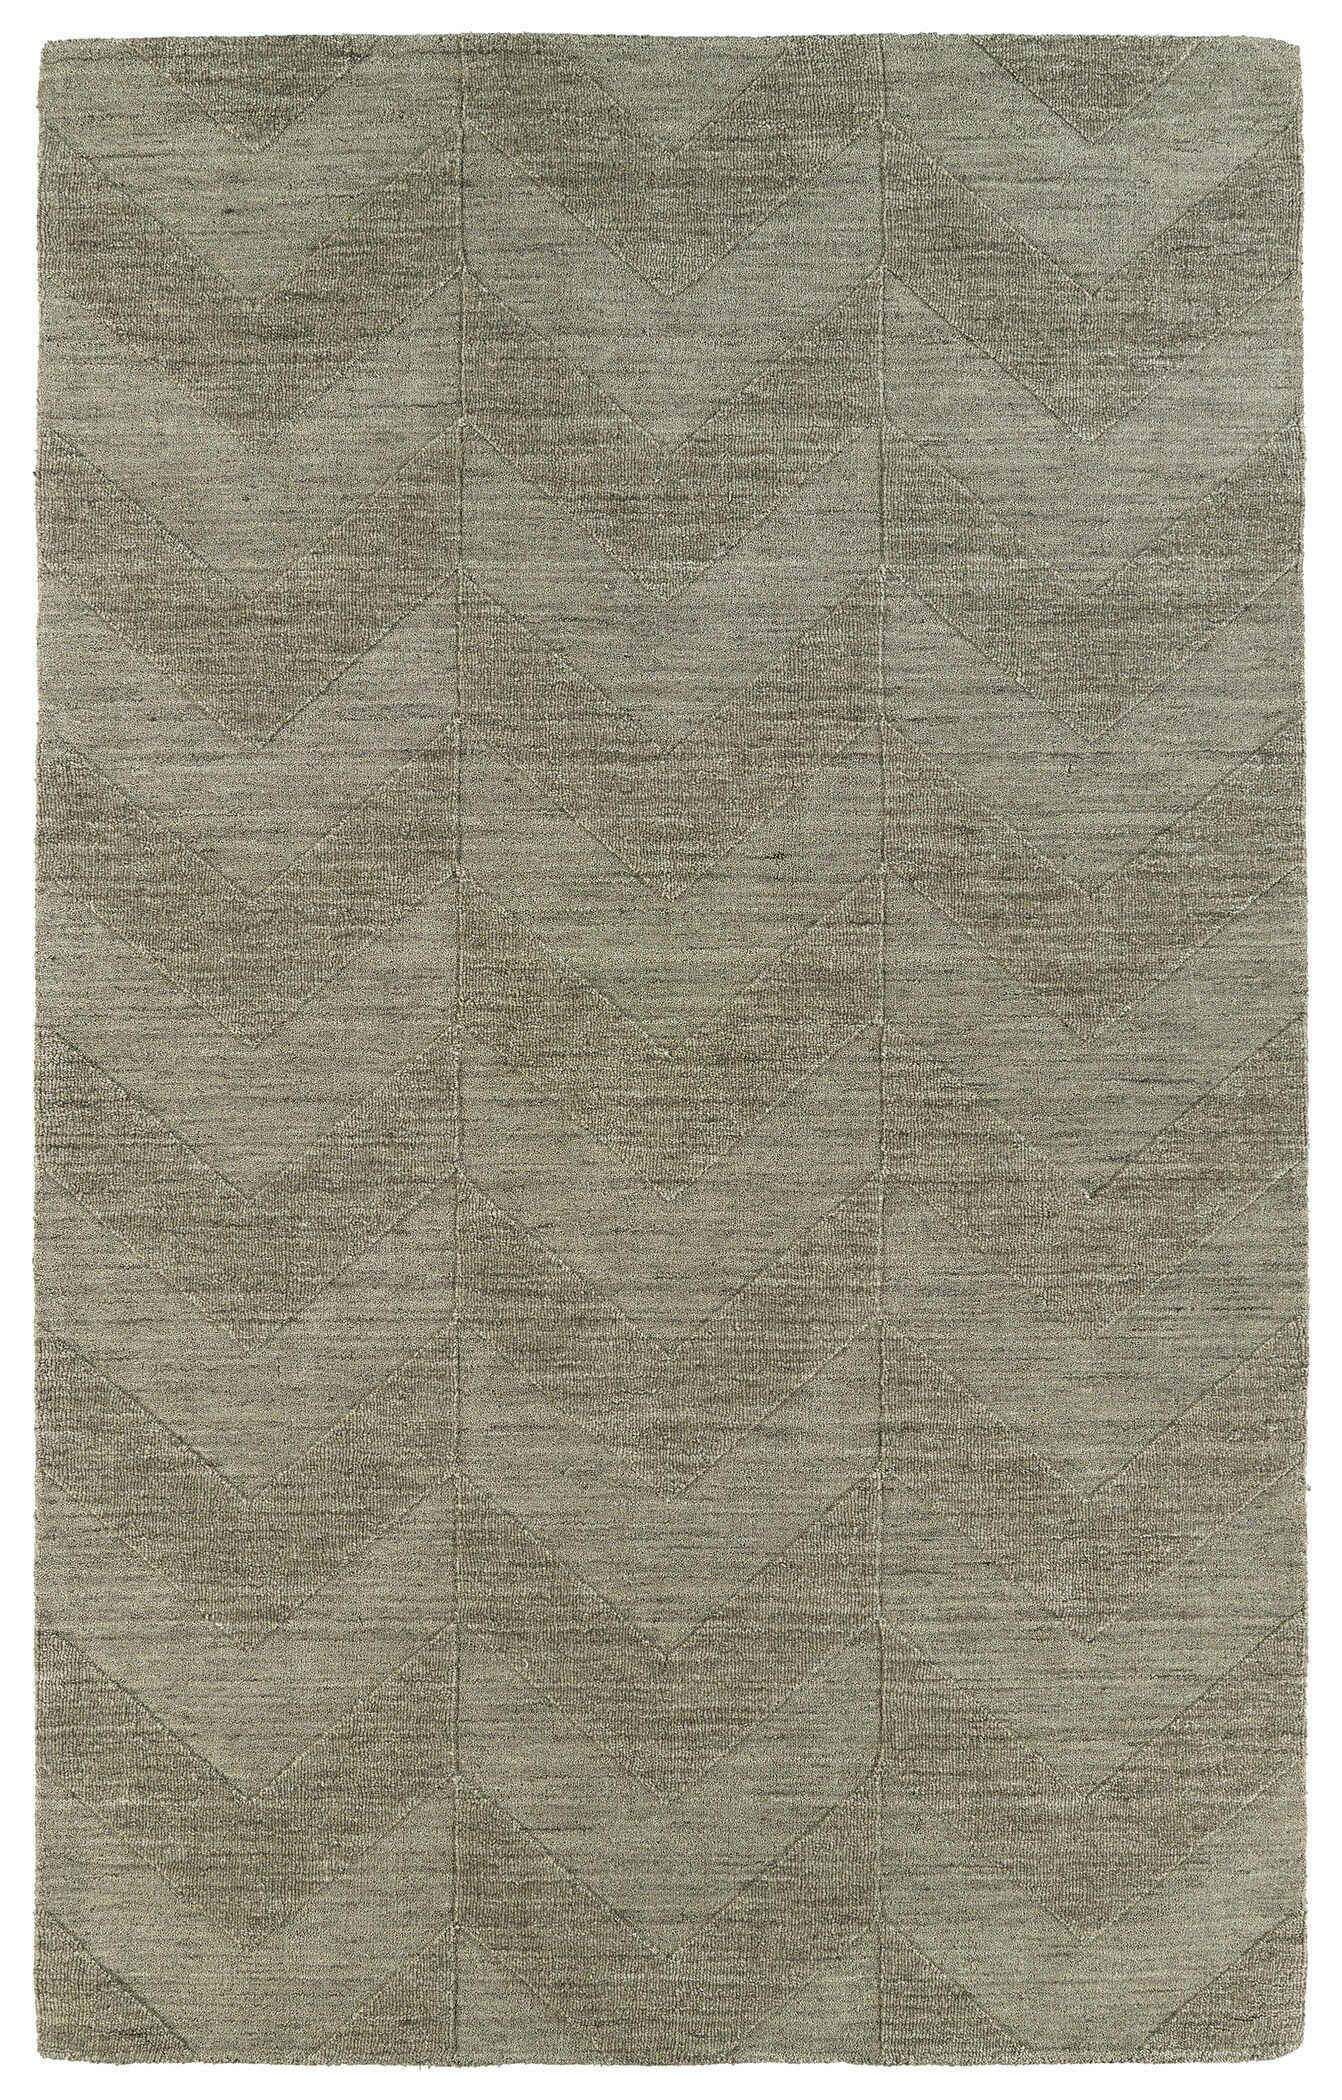 Dobson Light Brown Wool Geometric Area Rug Rug Size: Rectangle 9'6